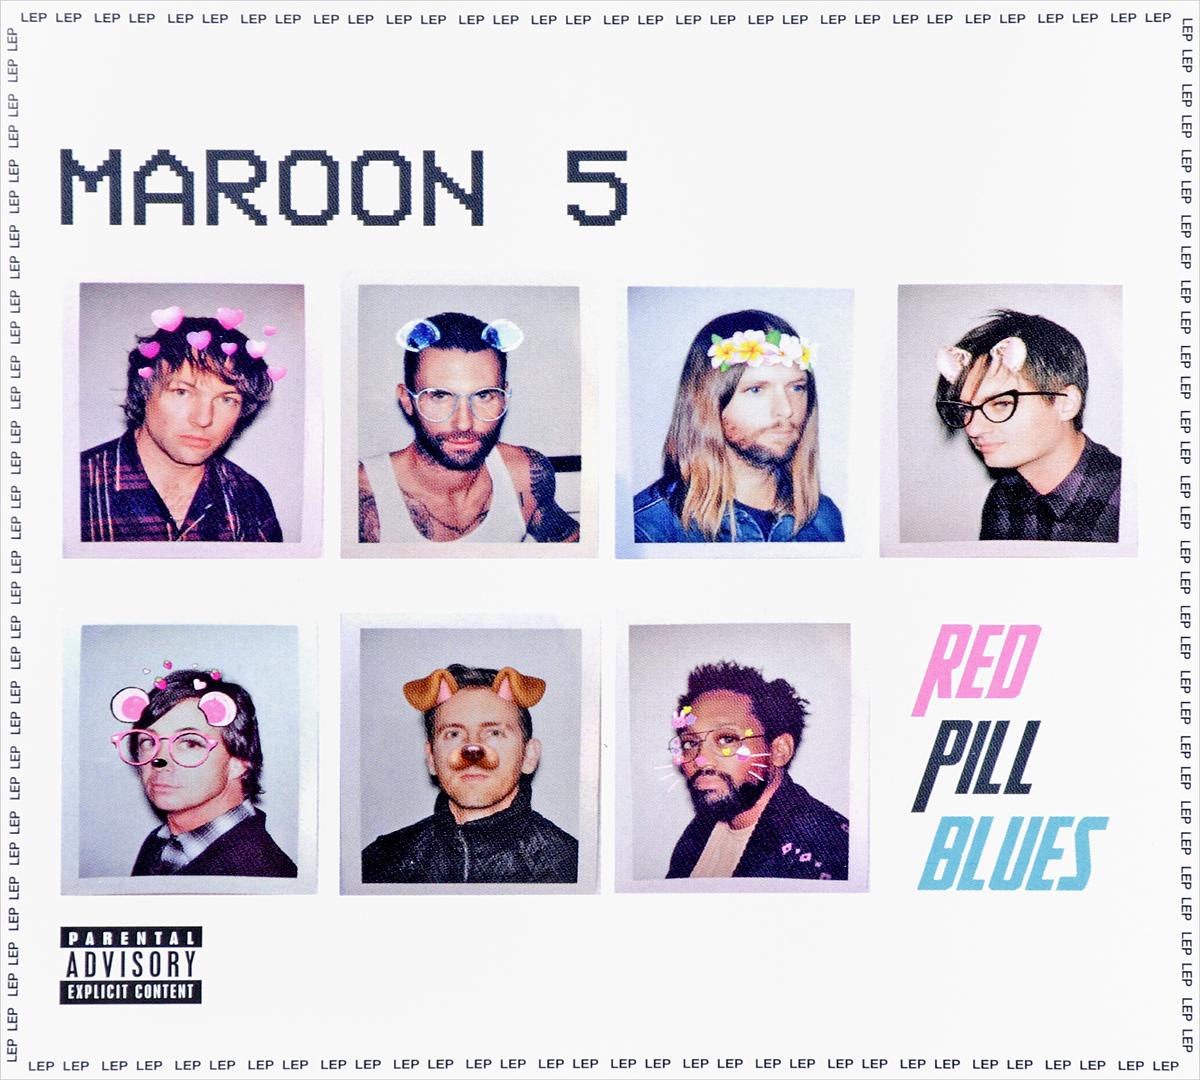 Maroon 5 Maroon 5. Red Pill Blues maroon 5 maroon 5 red pill blues